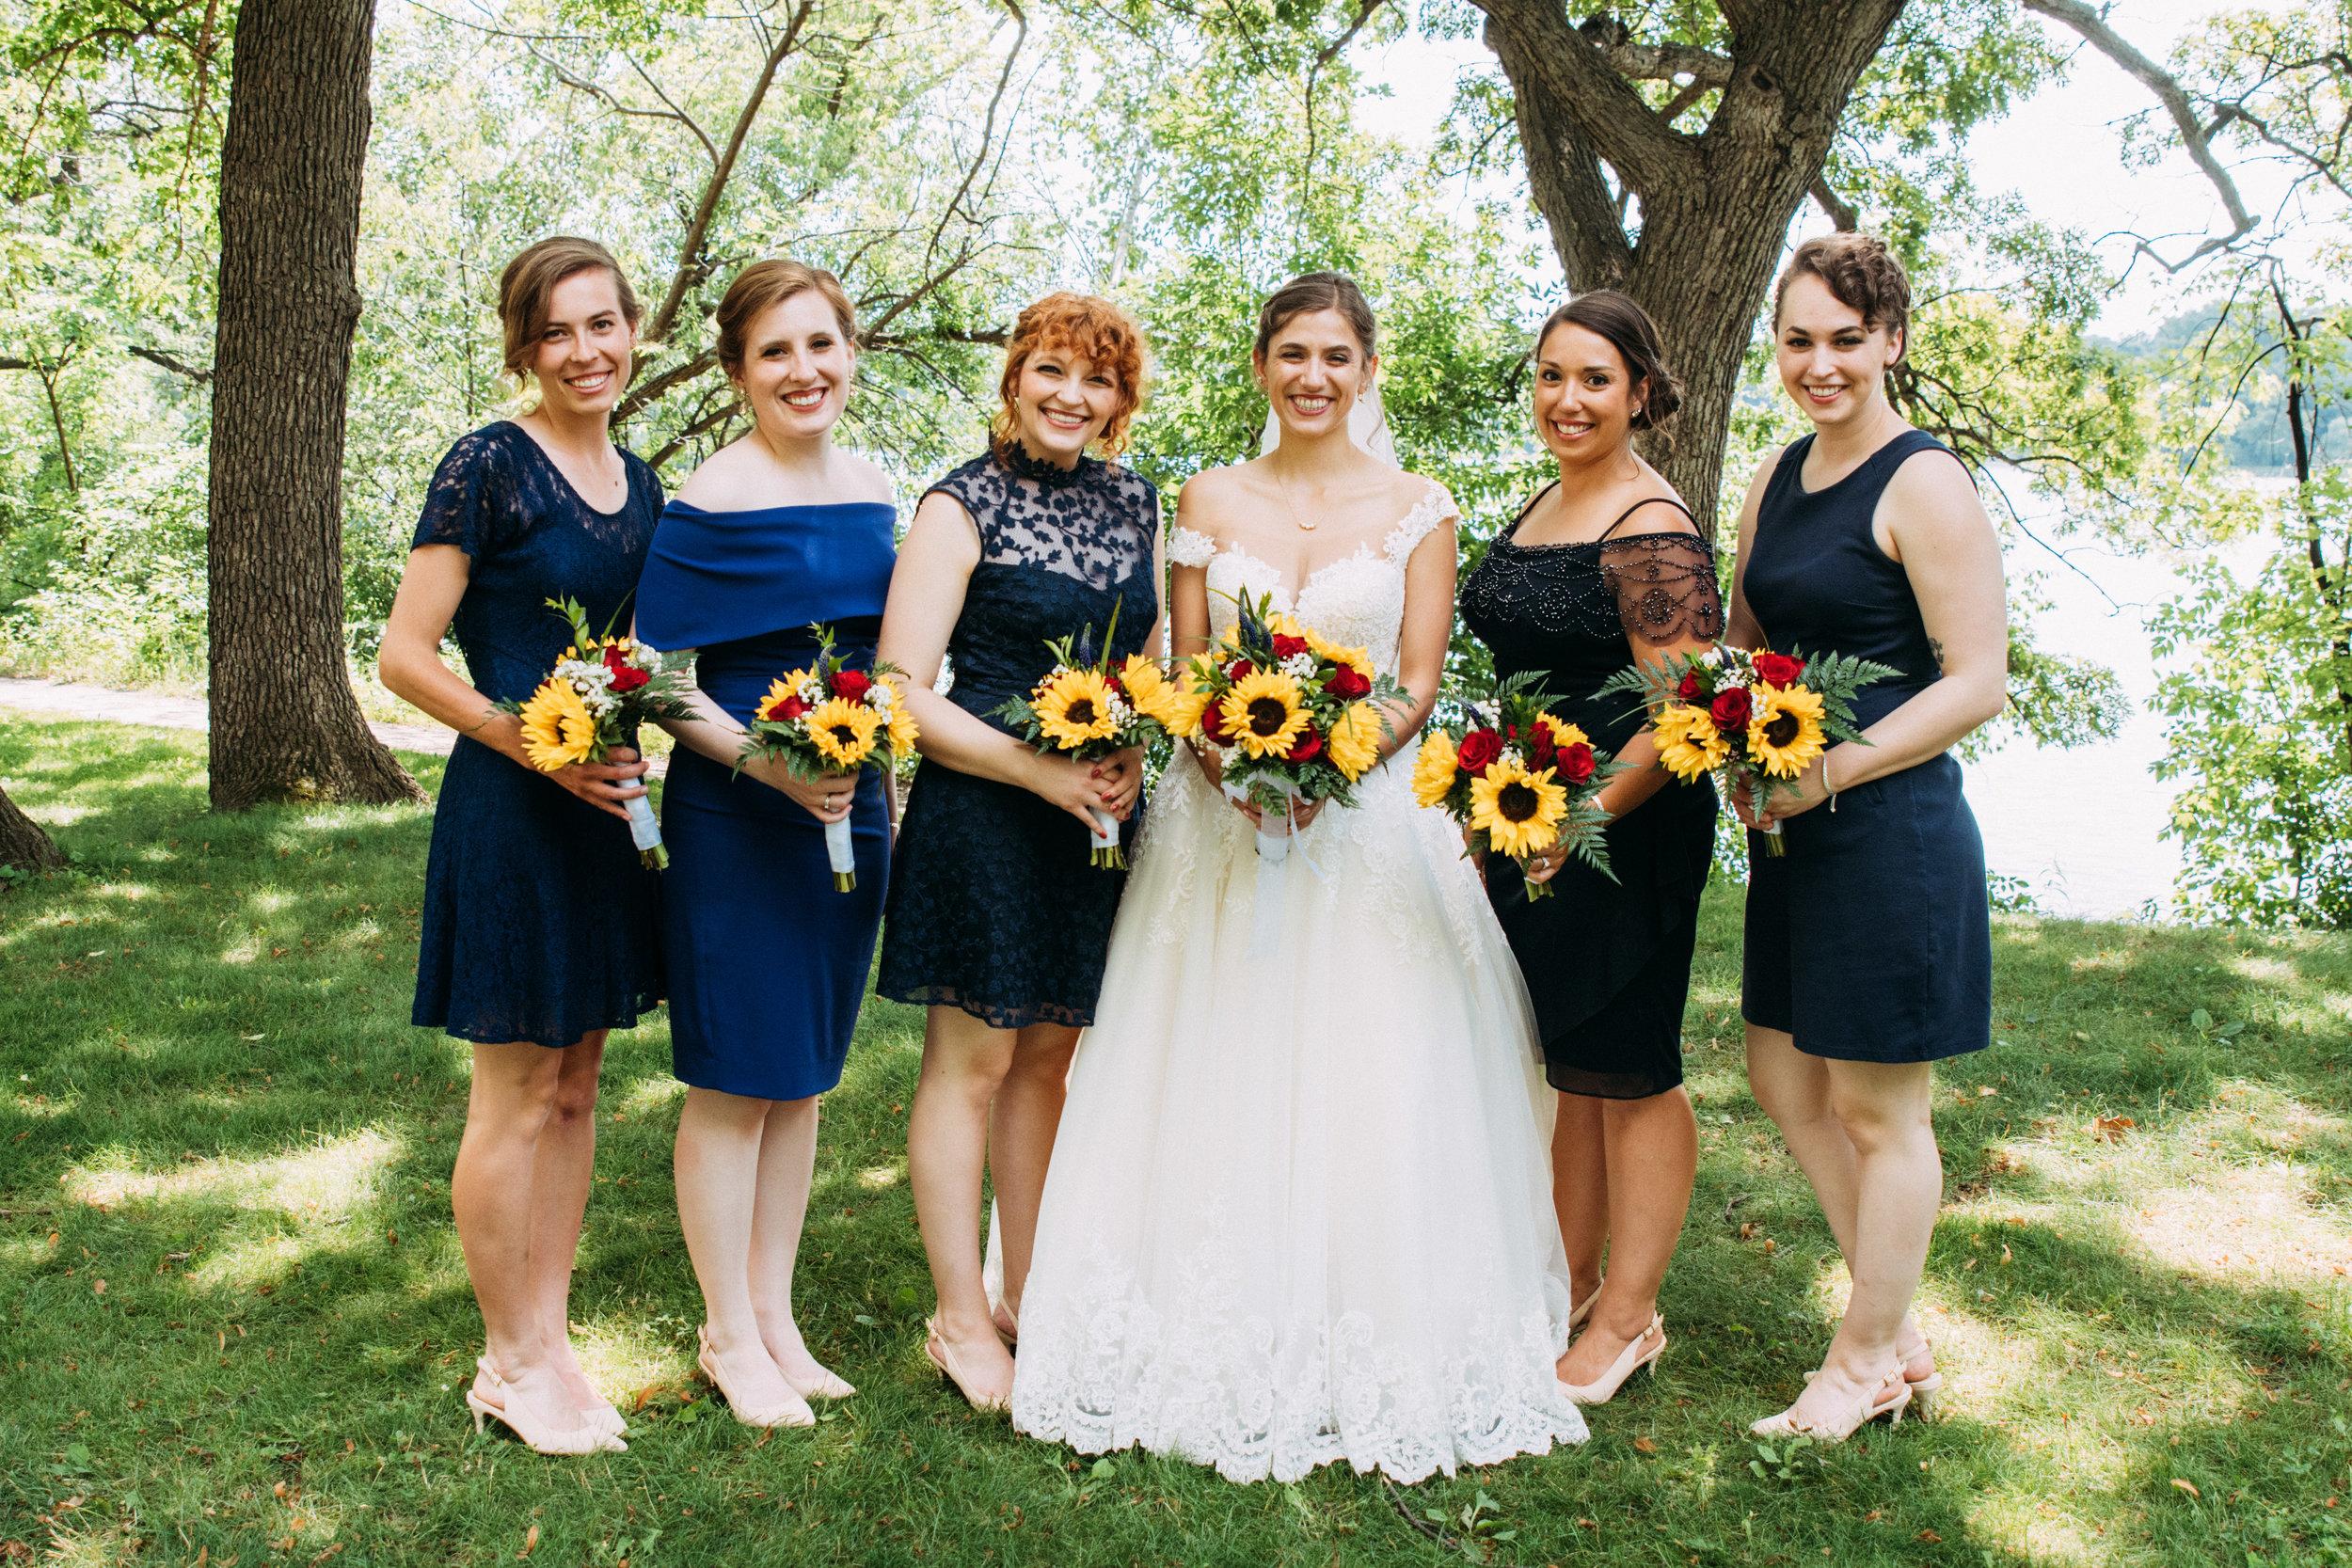 18-Liza_Chris_Minneapolis_Minnesota_Wedding.jpg